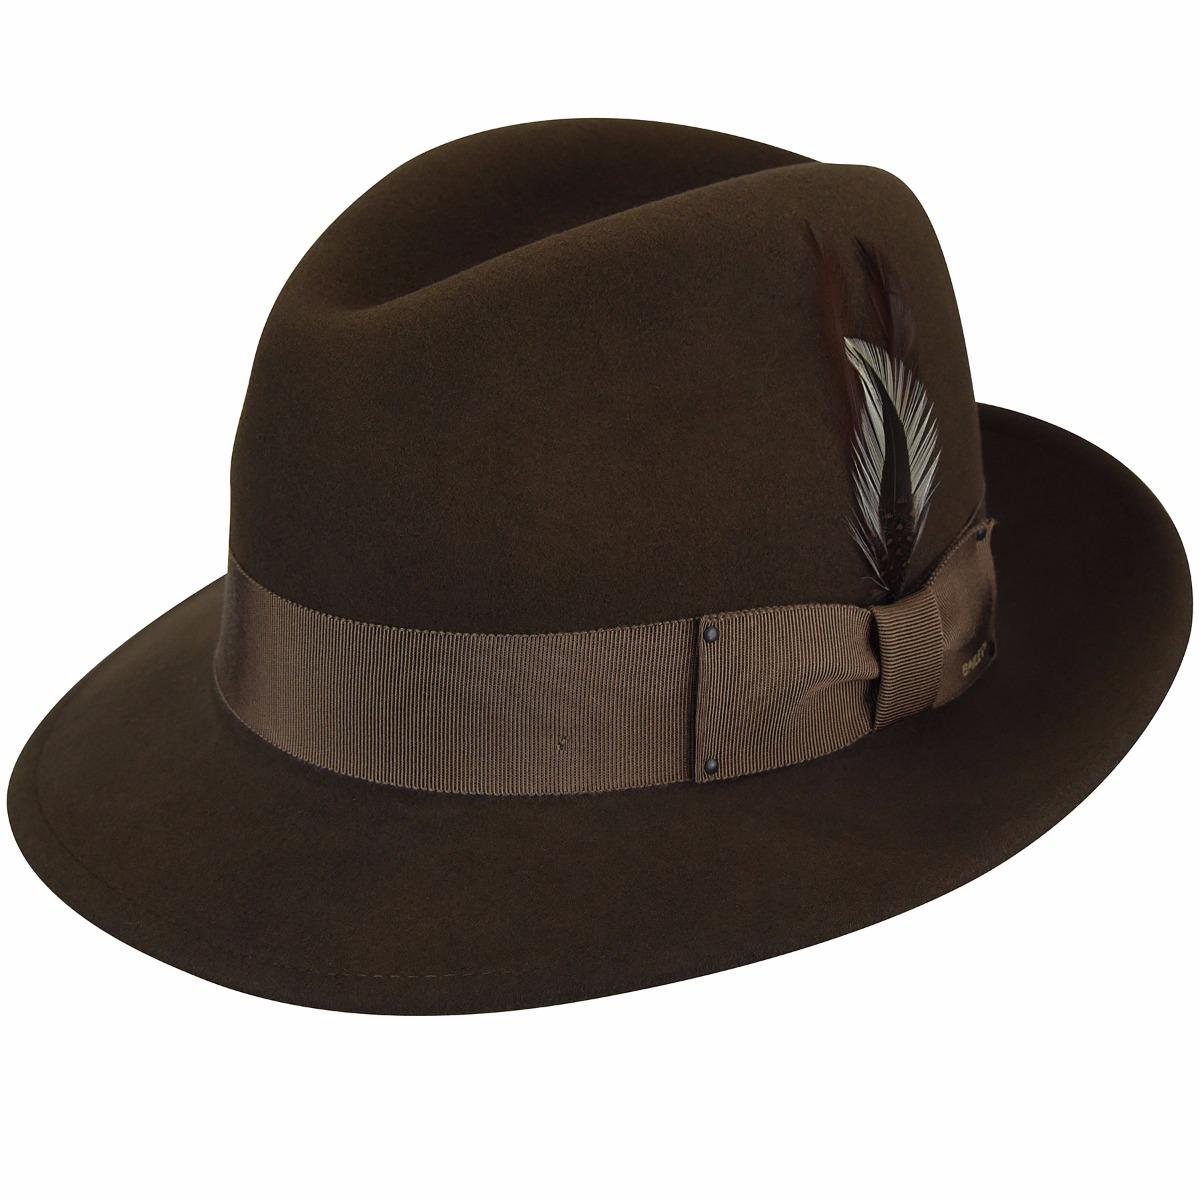 Bailey of Hollywood Blixen Wool Felt Fedora Hat Packable Water Repellent